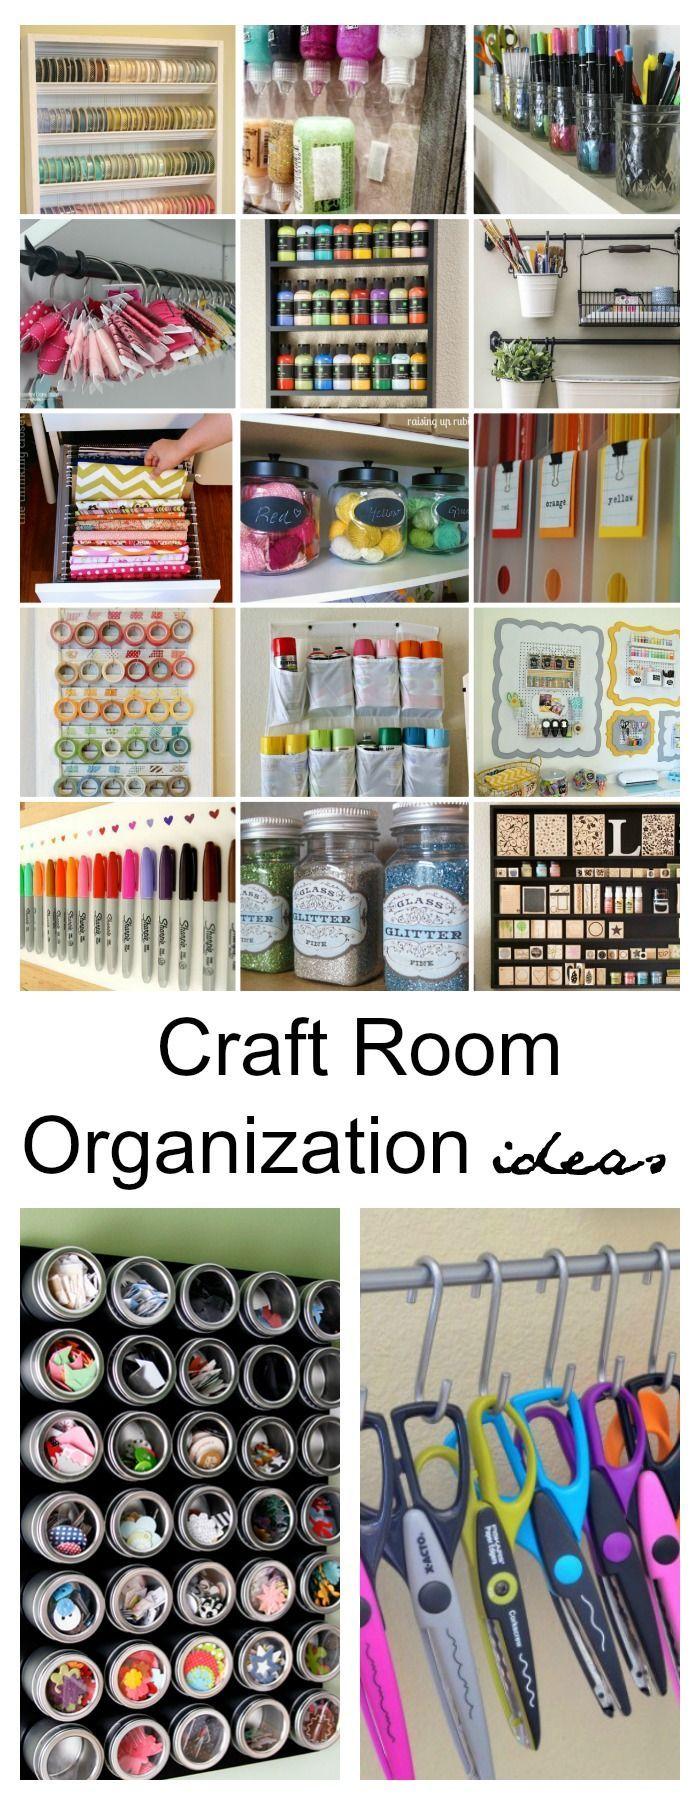 Craft Room Organization and Storage Ideas 248